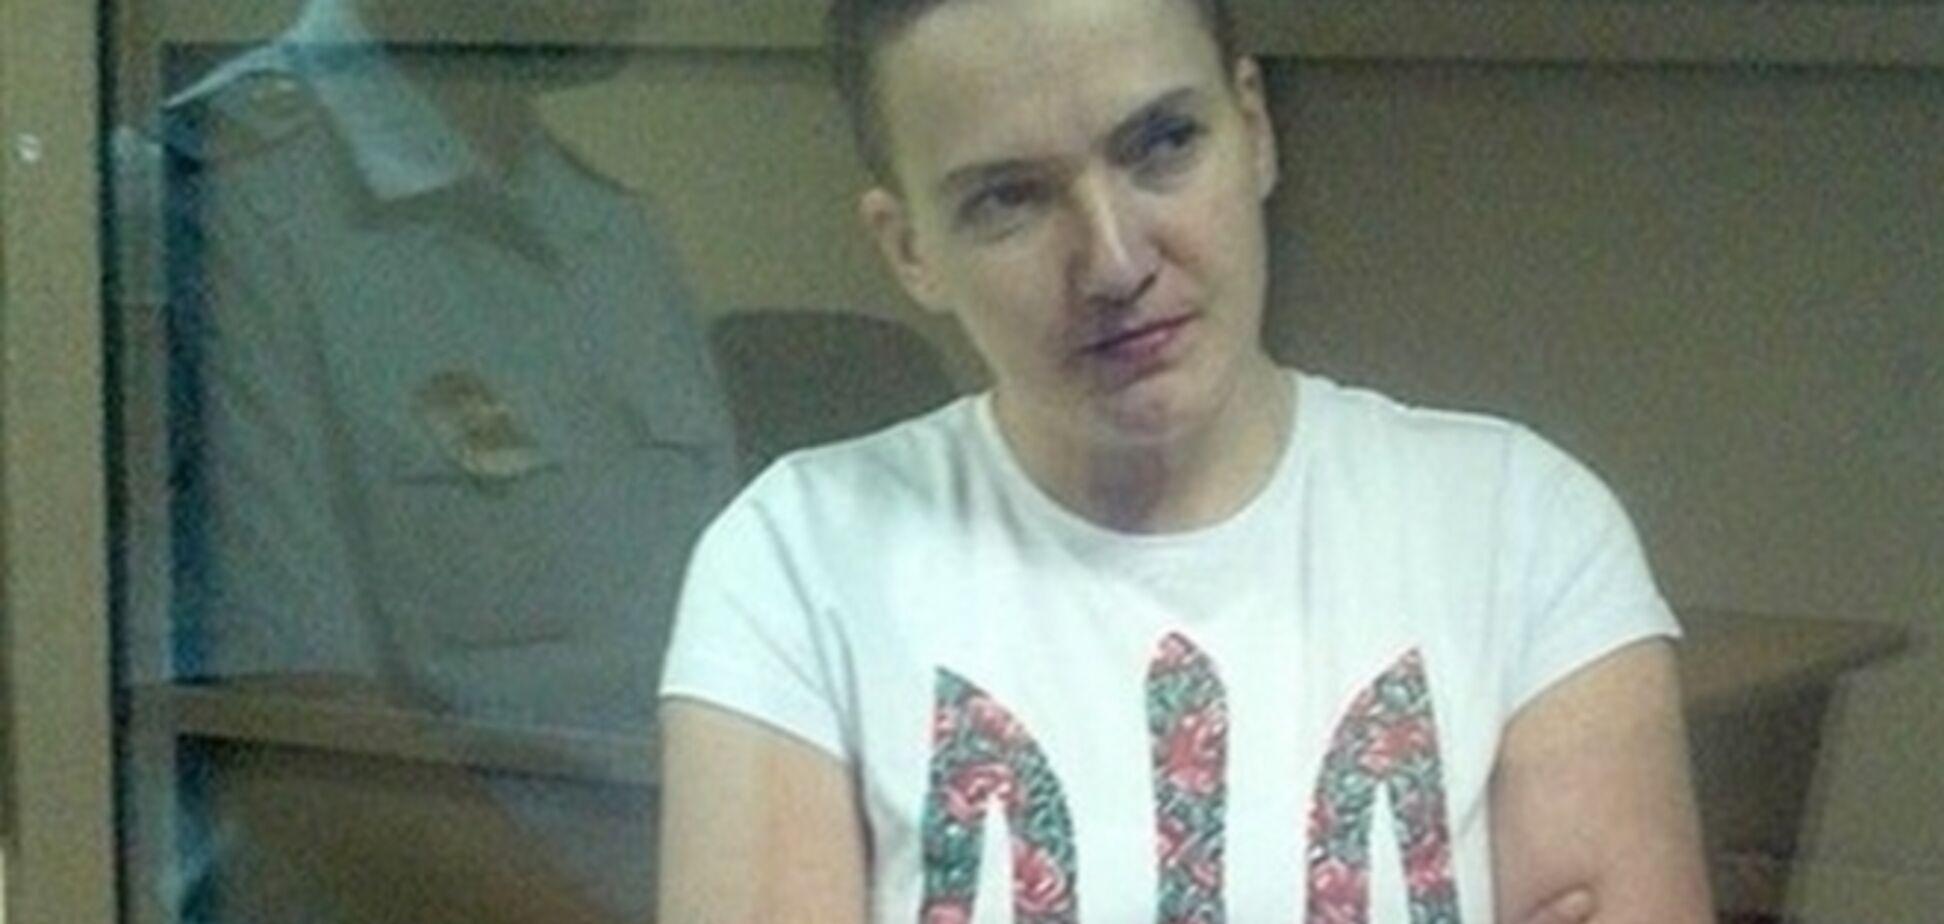 Защитник Савченко пожаловался на LifeNews в Генпрокуратуру РФ